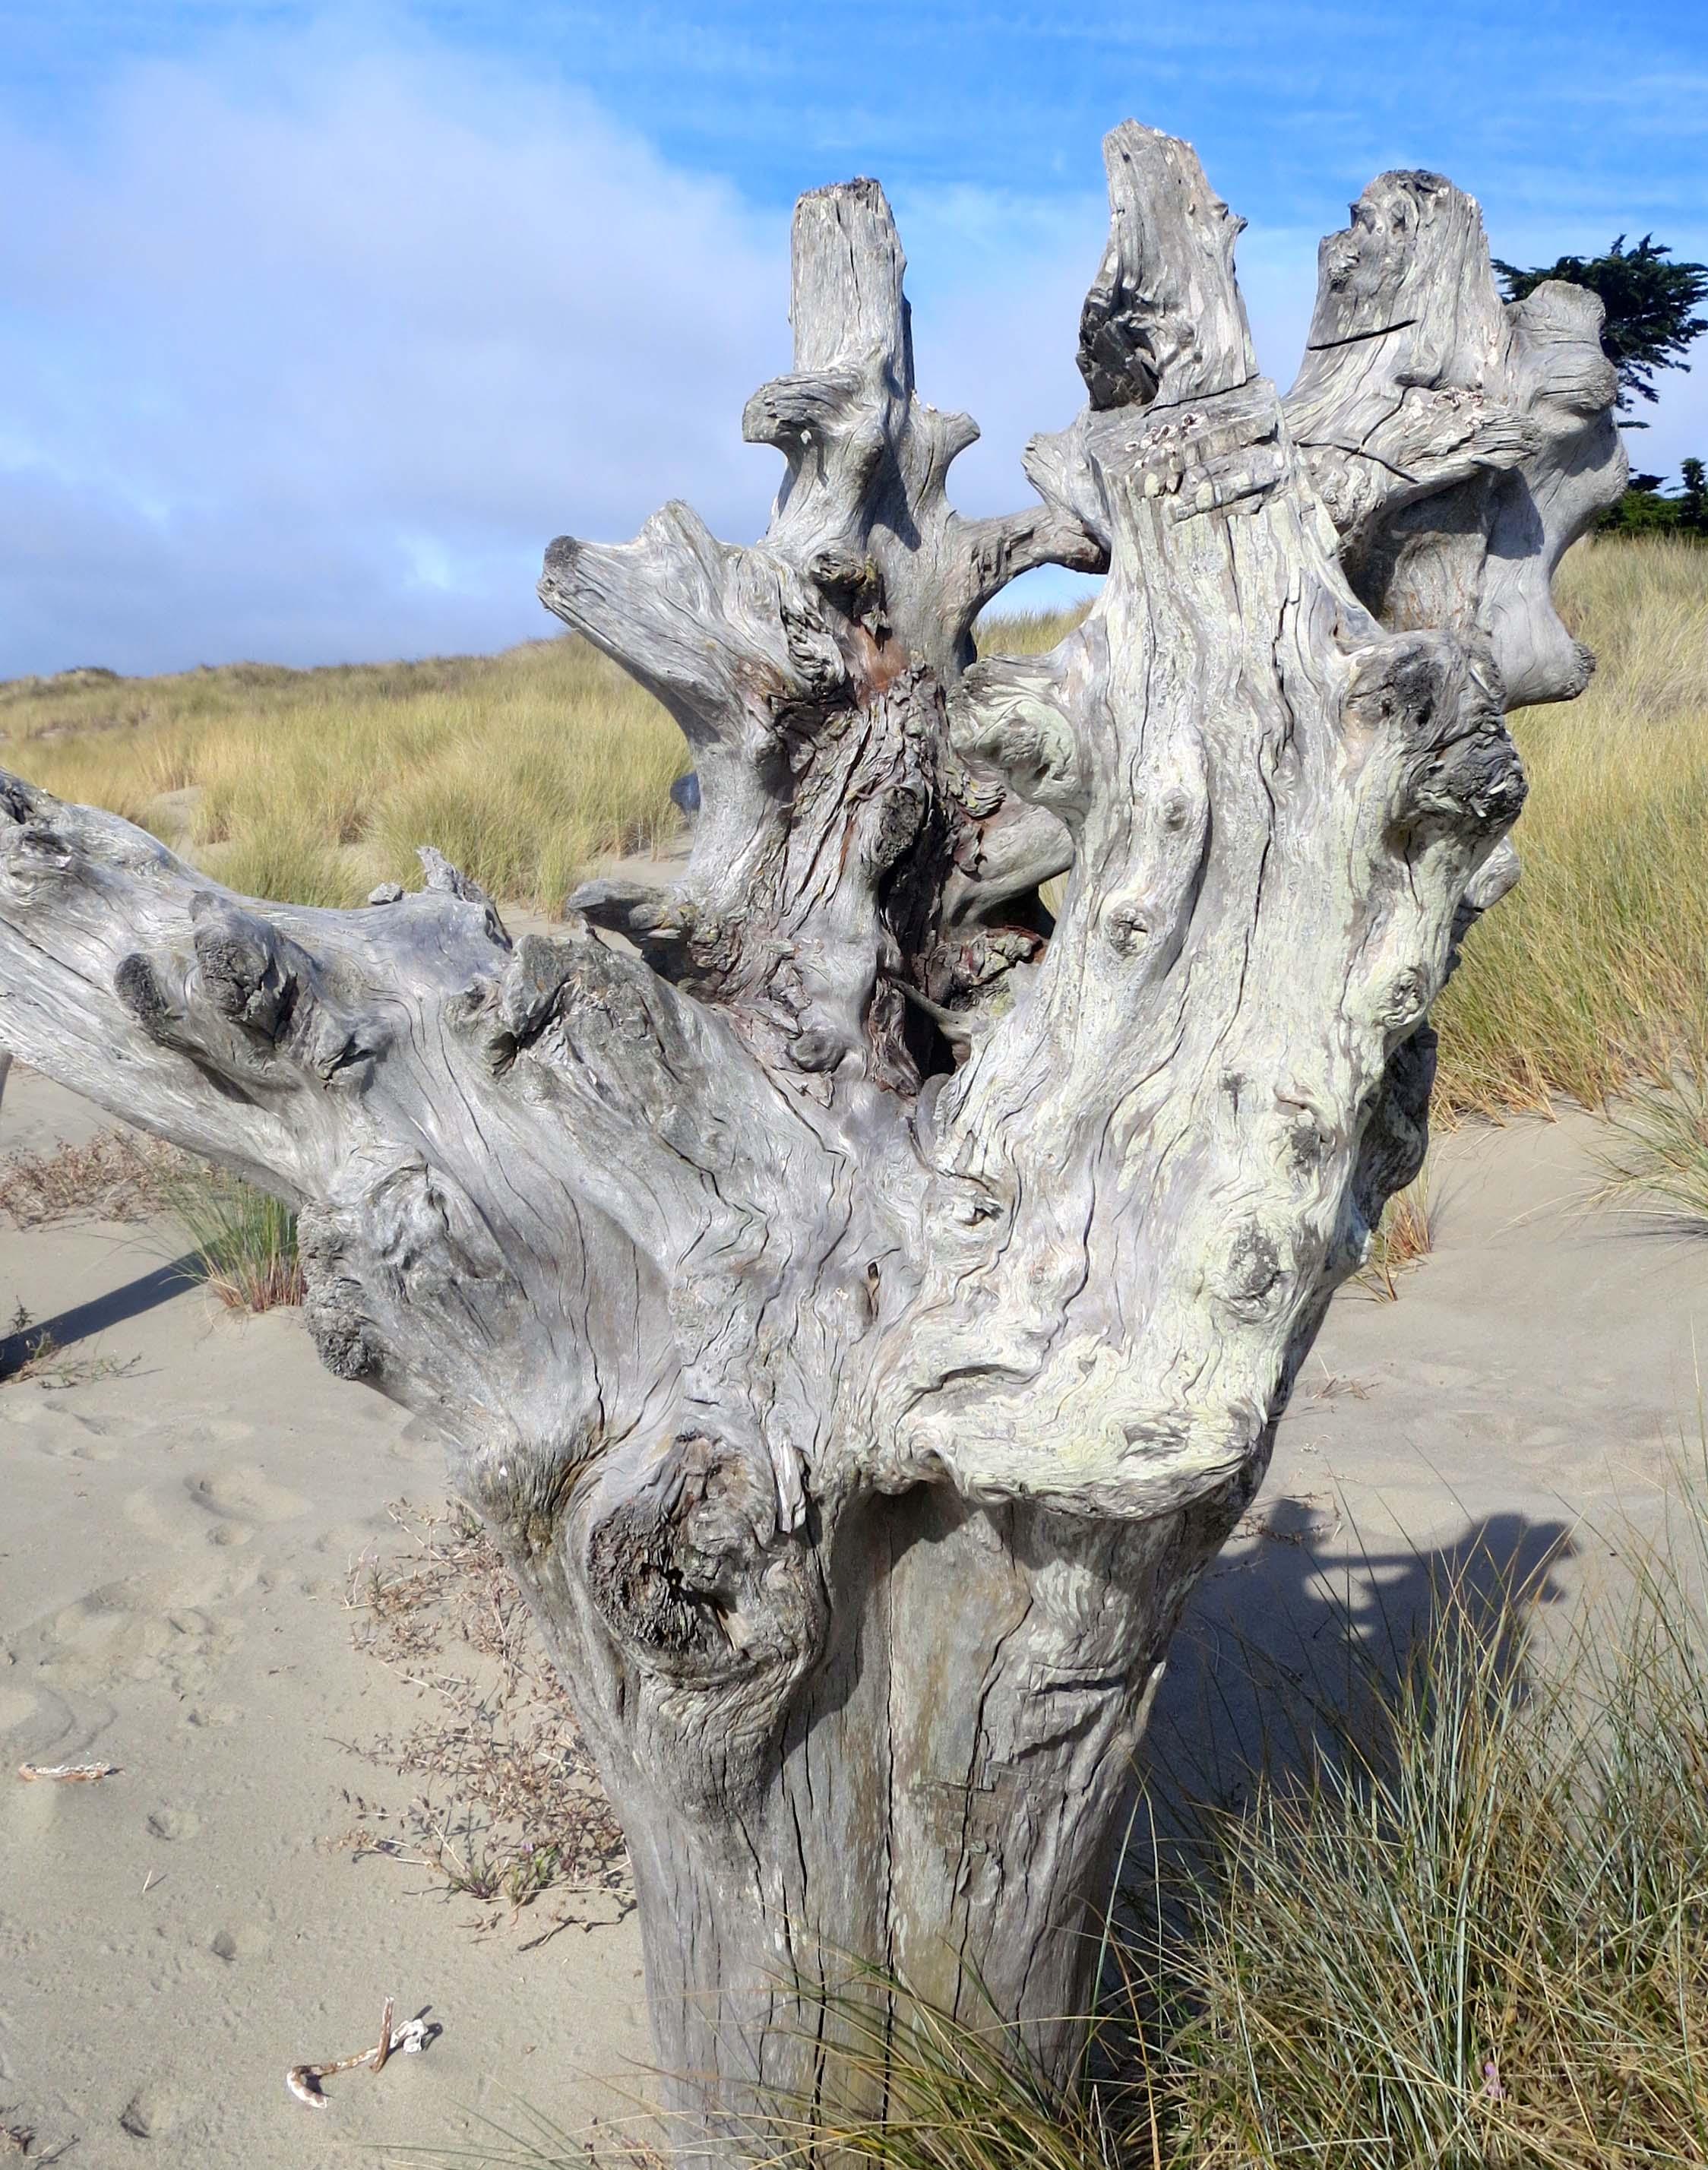 Photo by Curtis Mekemson of driftwood on Limantour Beach at Pt. Reyes National Seashore